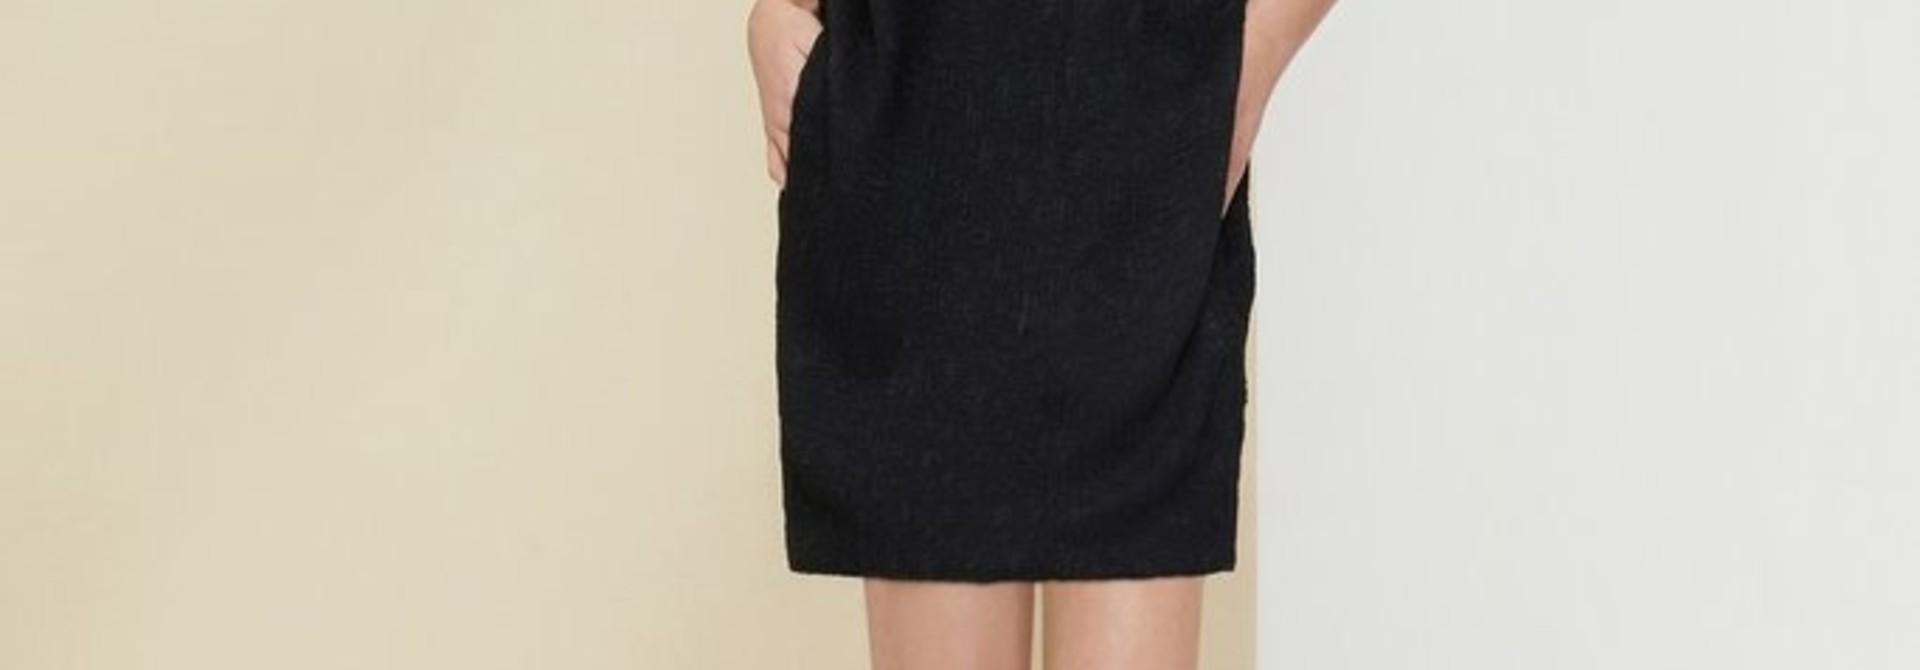 One Shoulder Dress - Blk - Sz 38